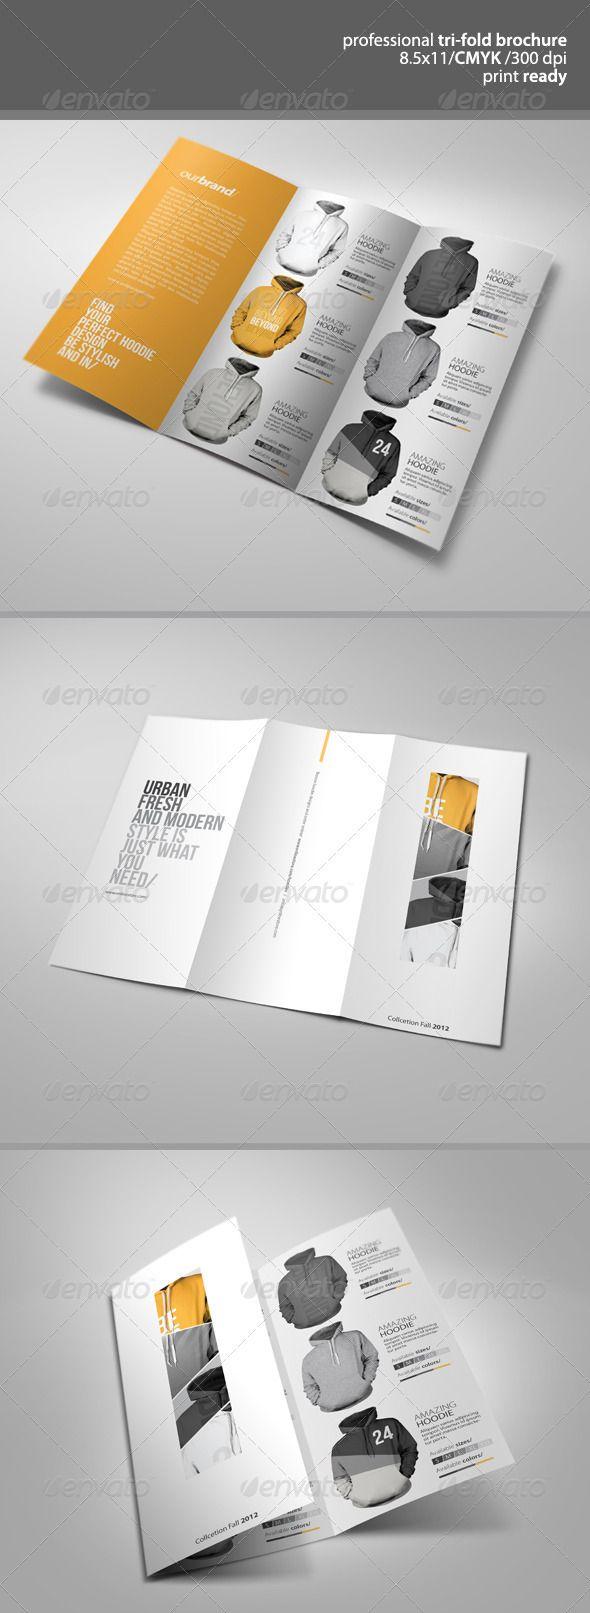 Apparel Tri-Fold Brochure - GraphicRiver Item for Sale